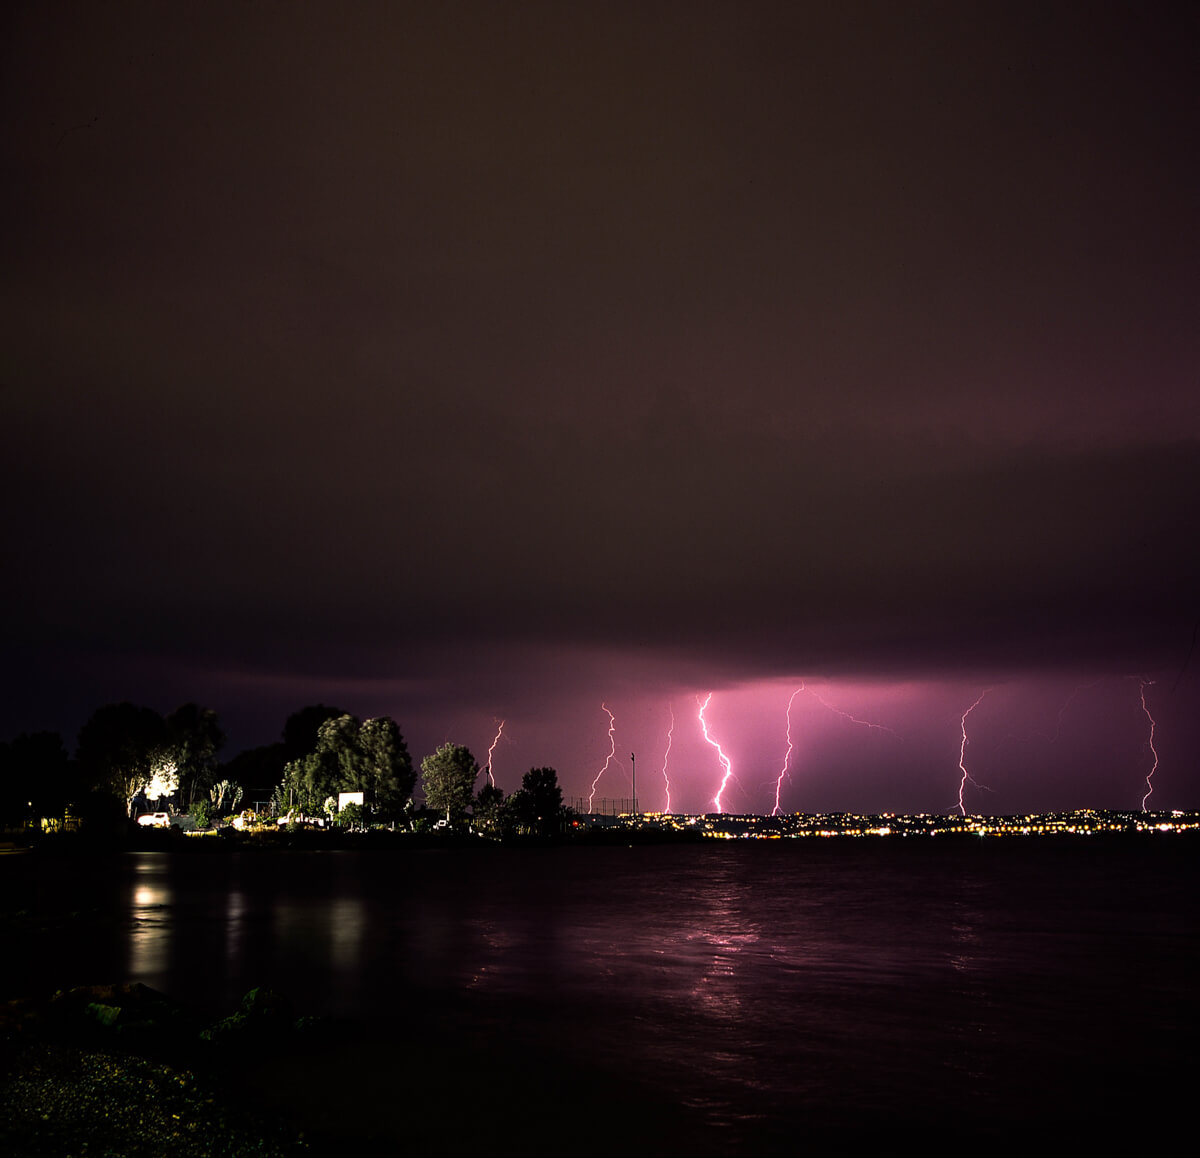 5 Frames... Of lightning on Fuji Provia 100F (120 Format / EI 100 / Hasselblad 500CM + Carl Zeiss Distagon CF 50mm f/4 - by Dimitris Chatzis